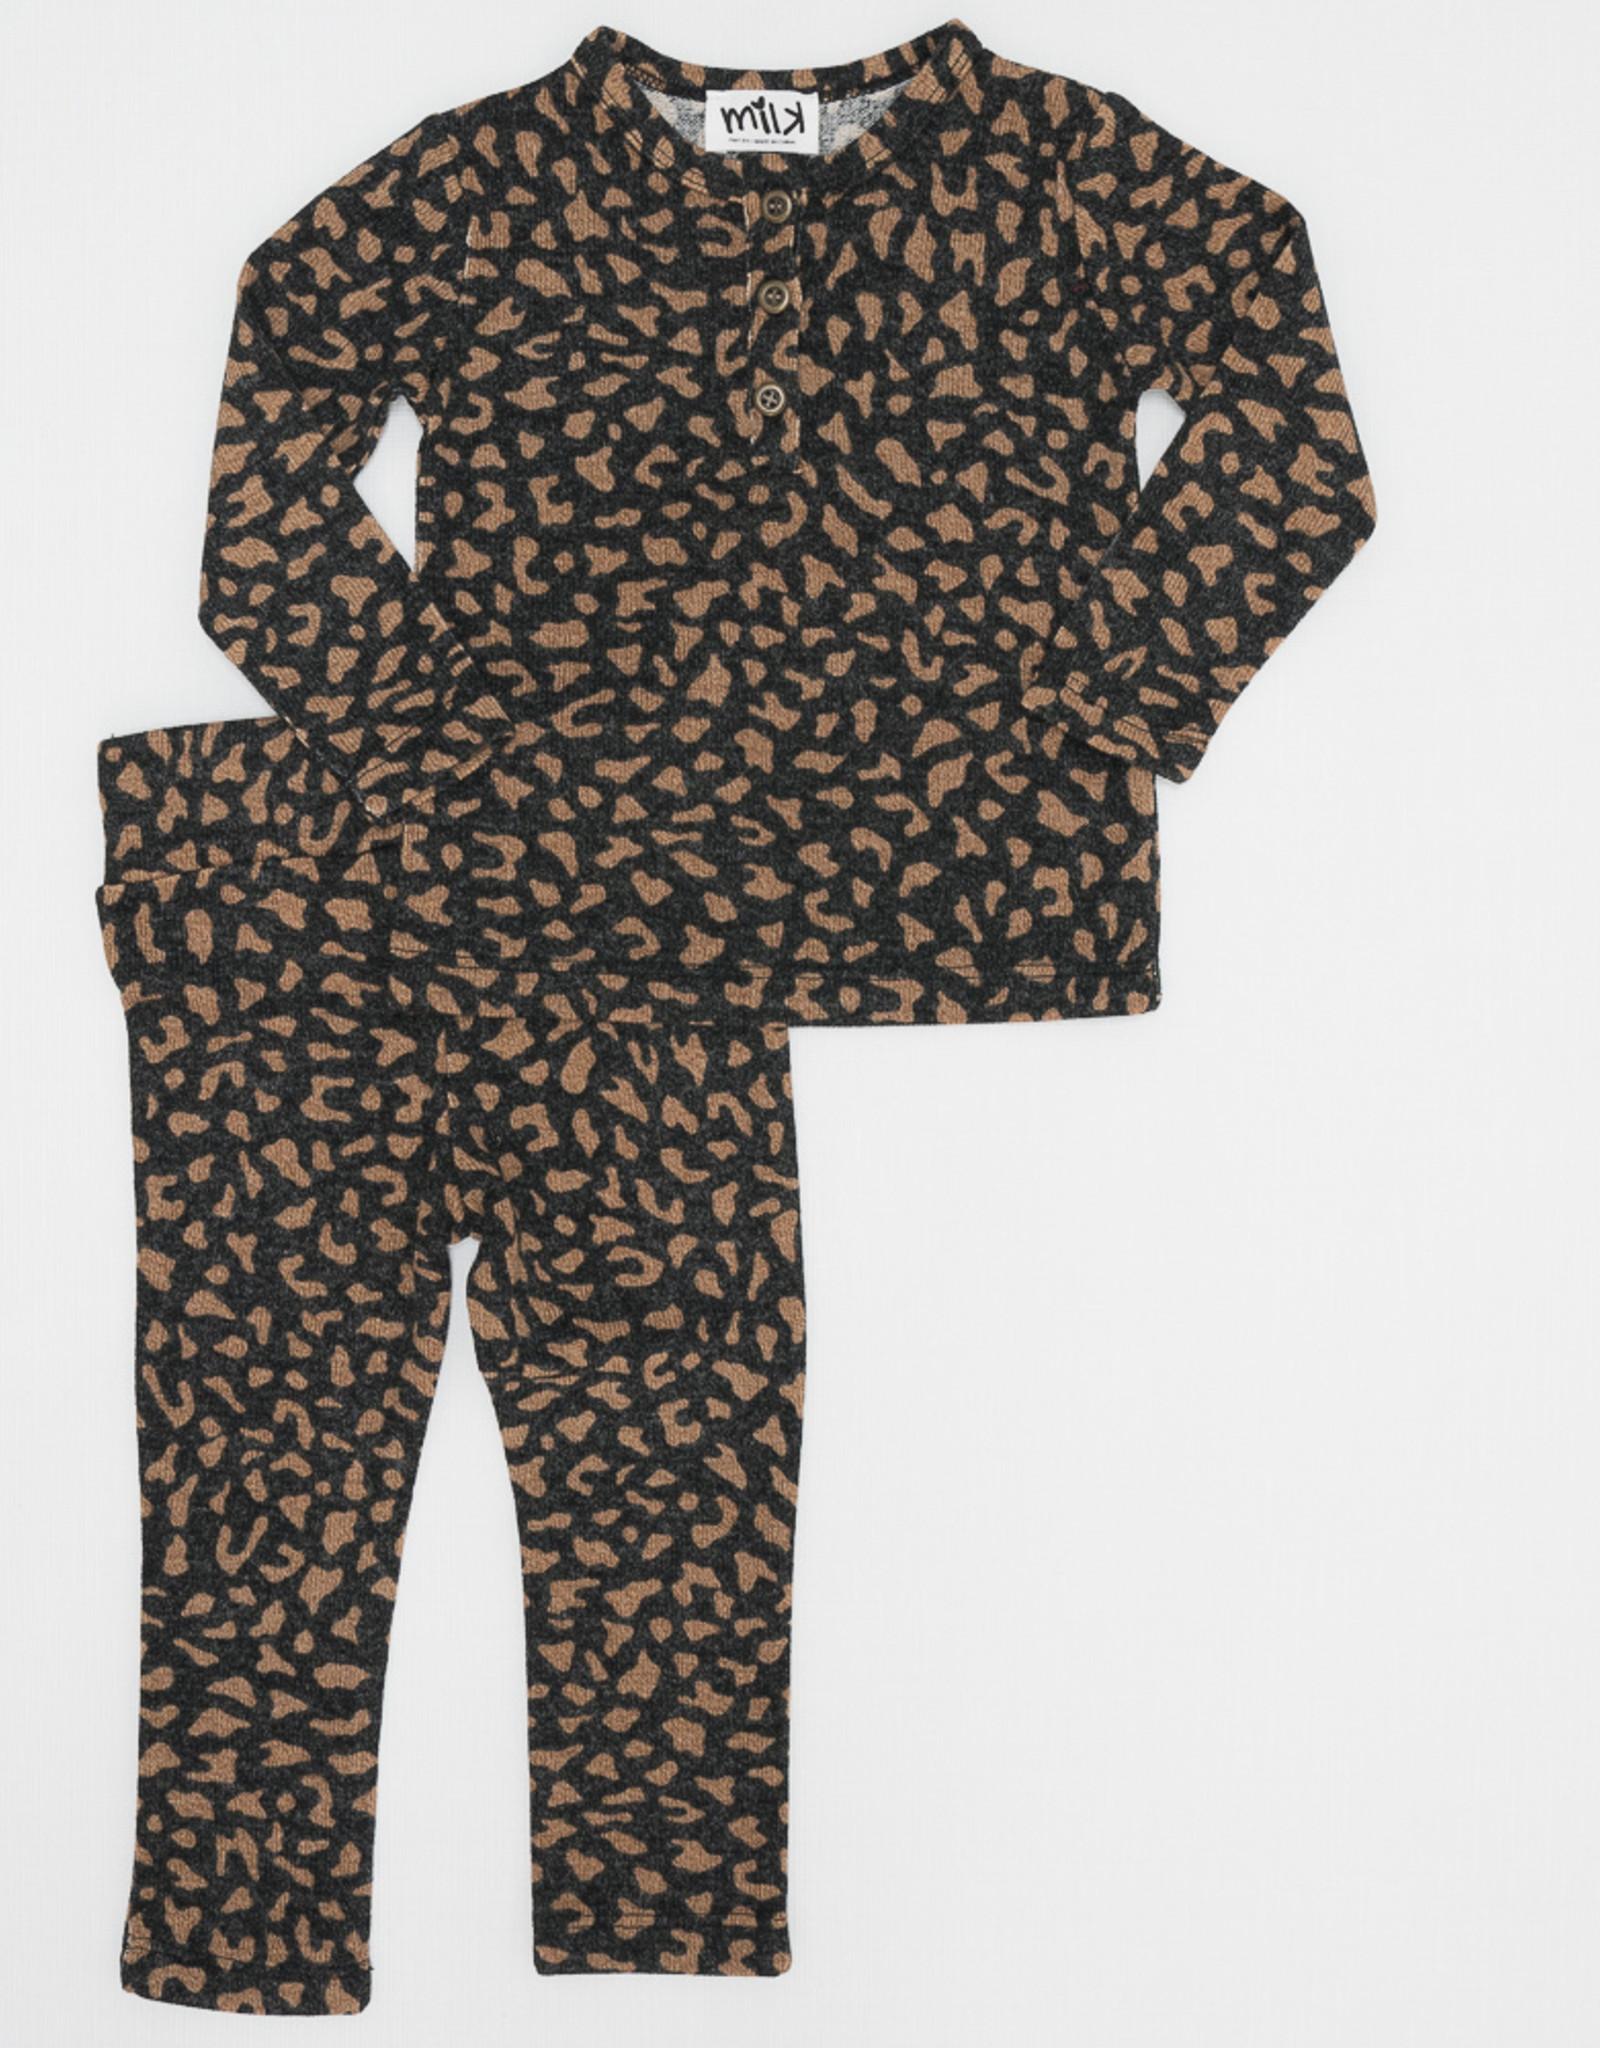 Milk Milk Leopard Baby Set with 3 Buttons (Top/Pants)